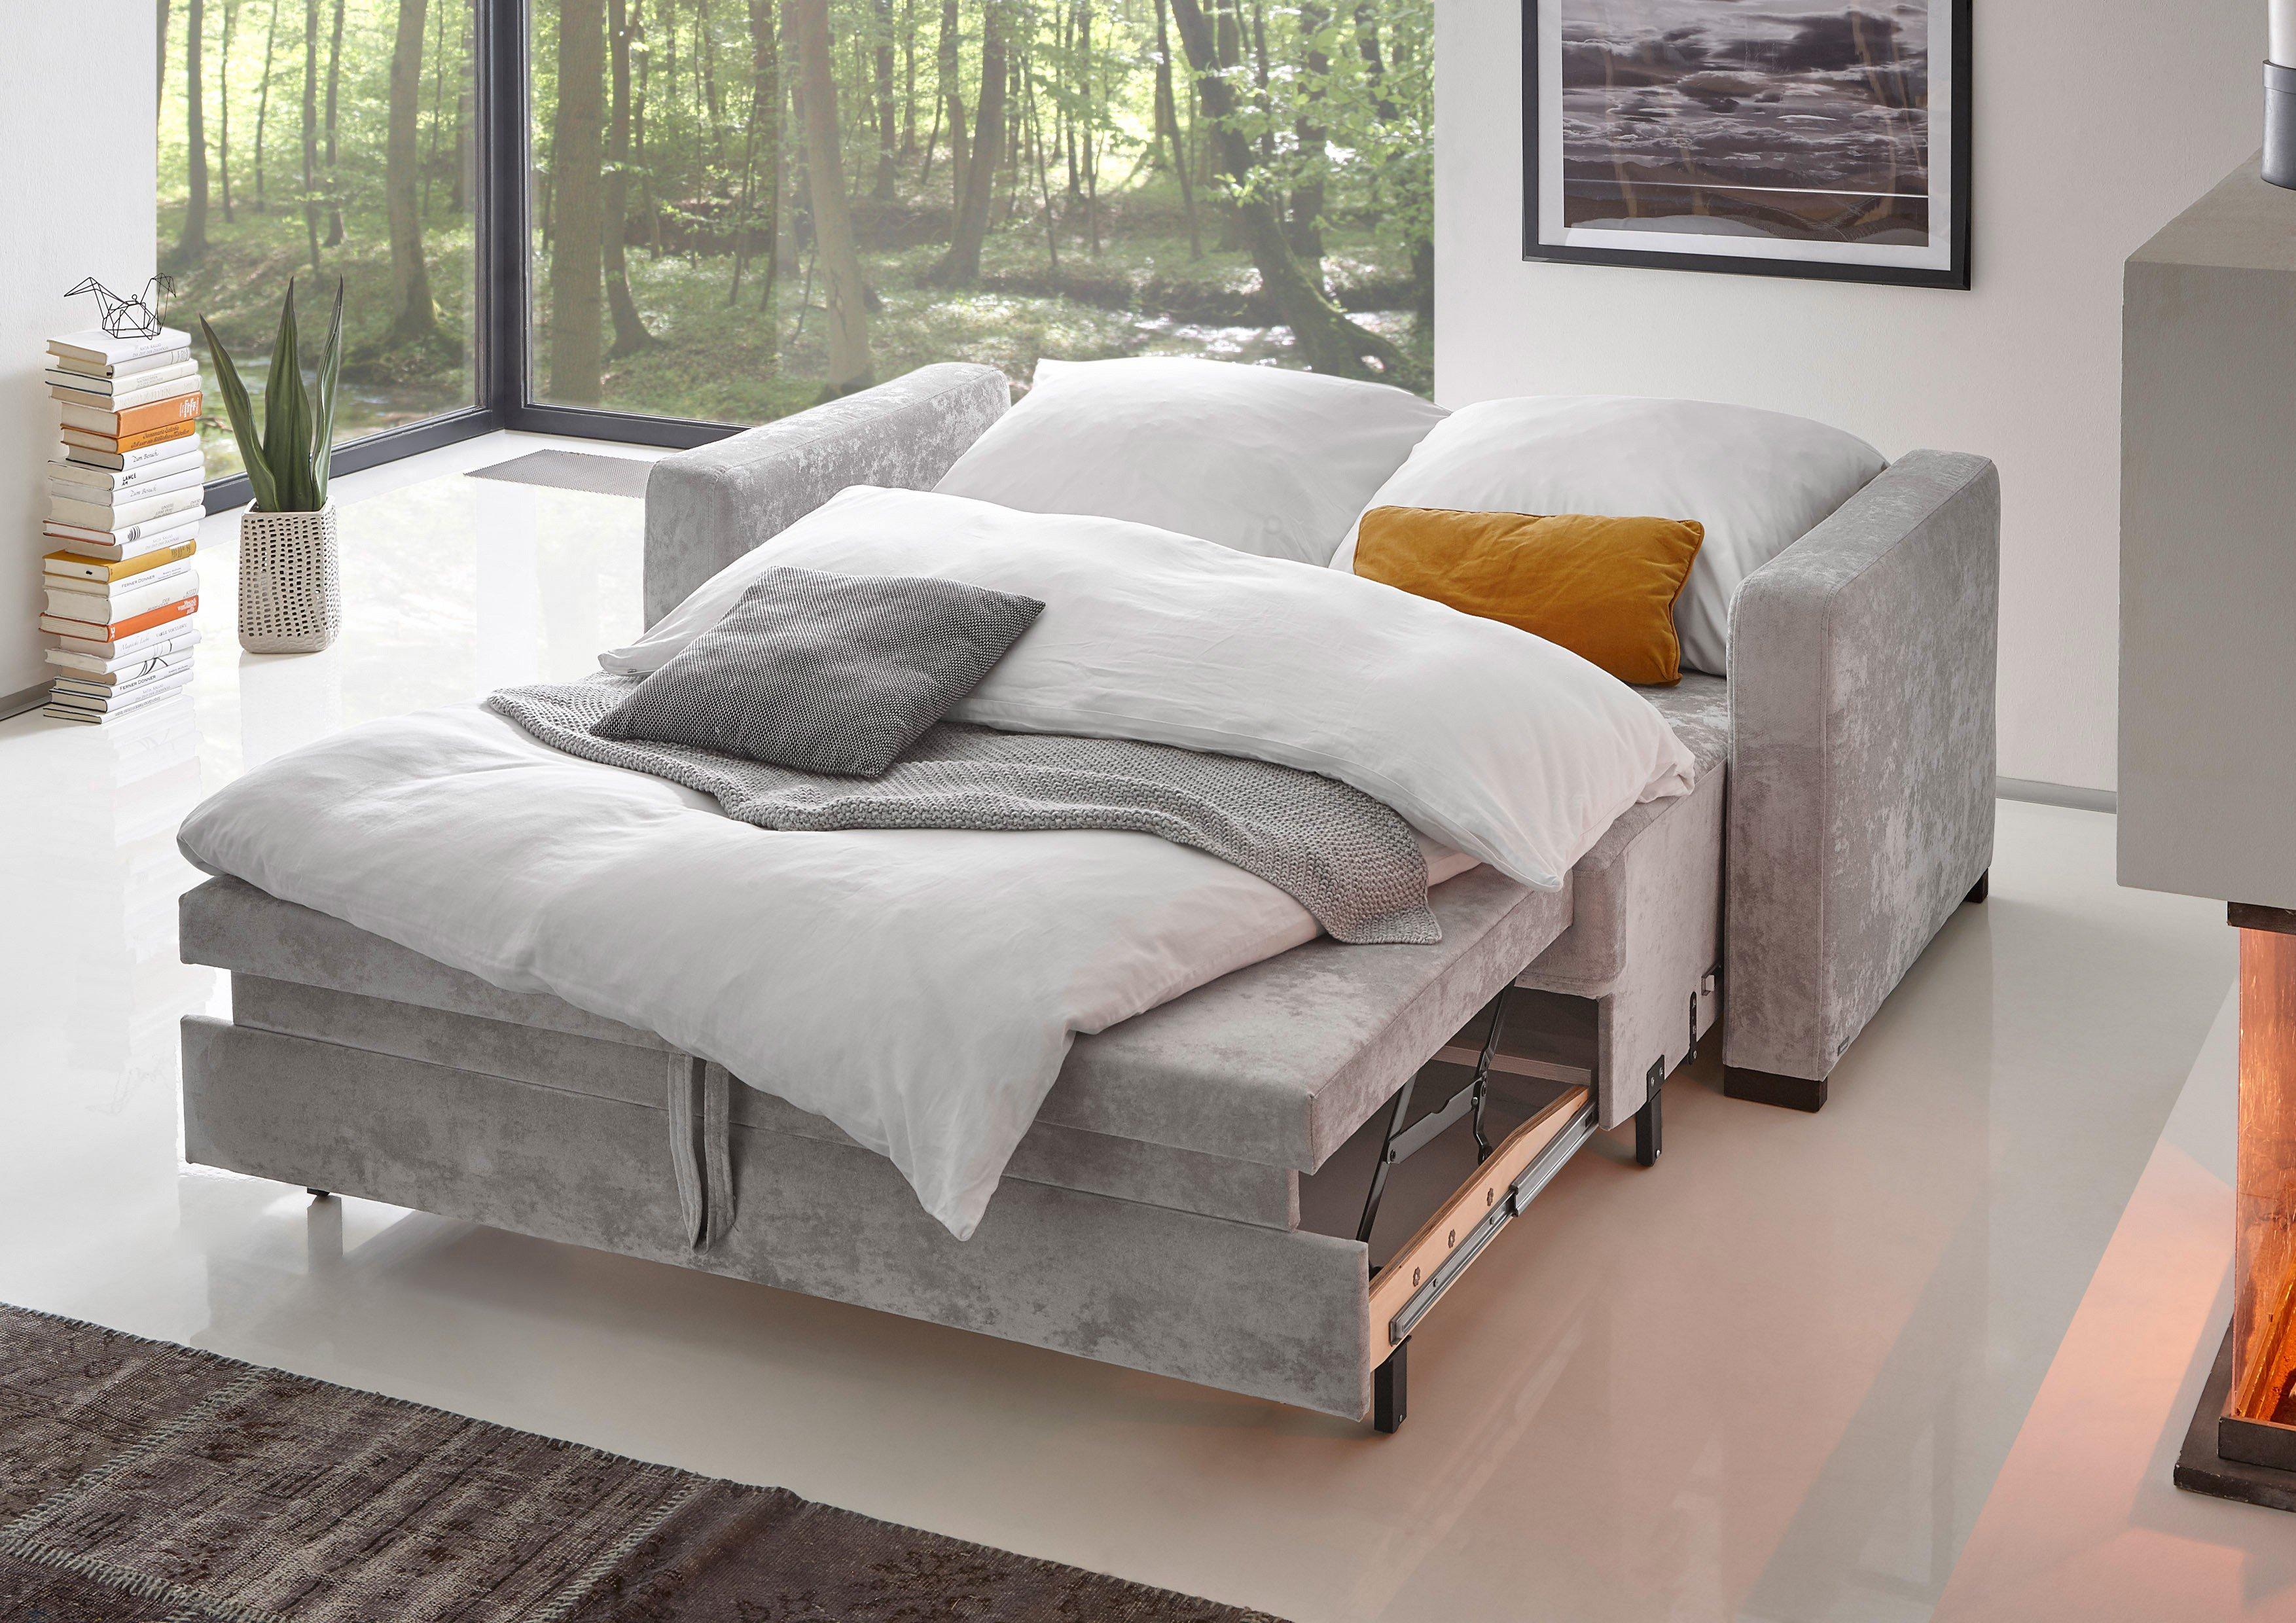 reposa polsterm bel schlafsofa padua in grau m bel letz online shop. Black Bedroom Furniture Sets. Home Design Ideas